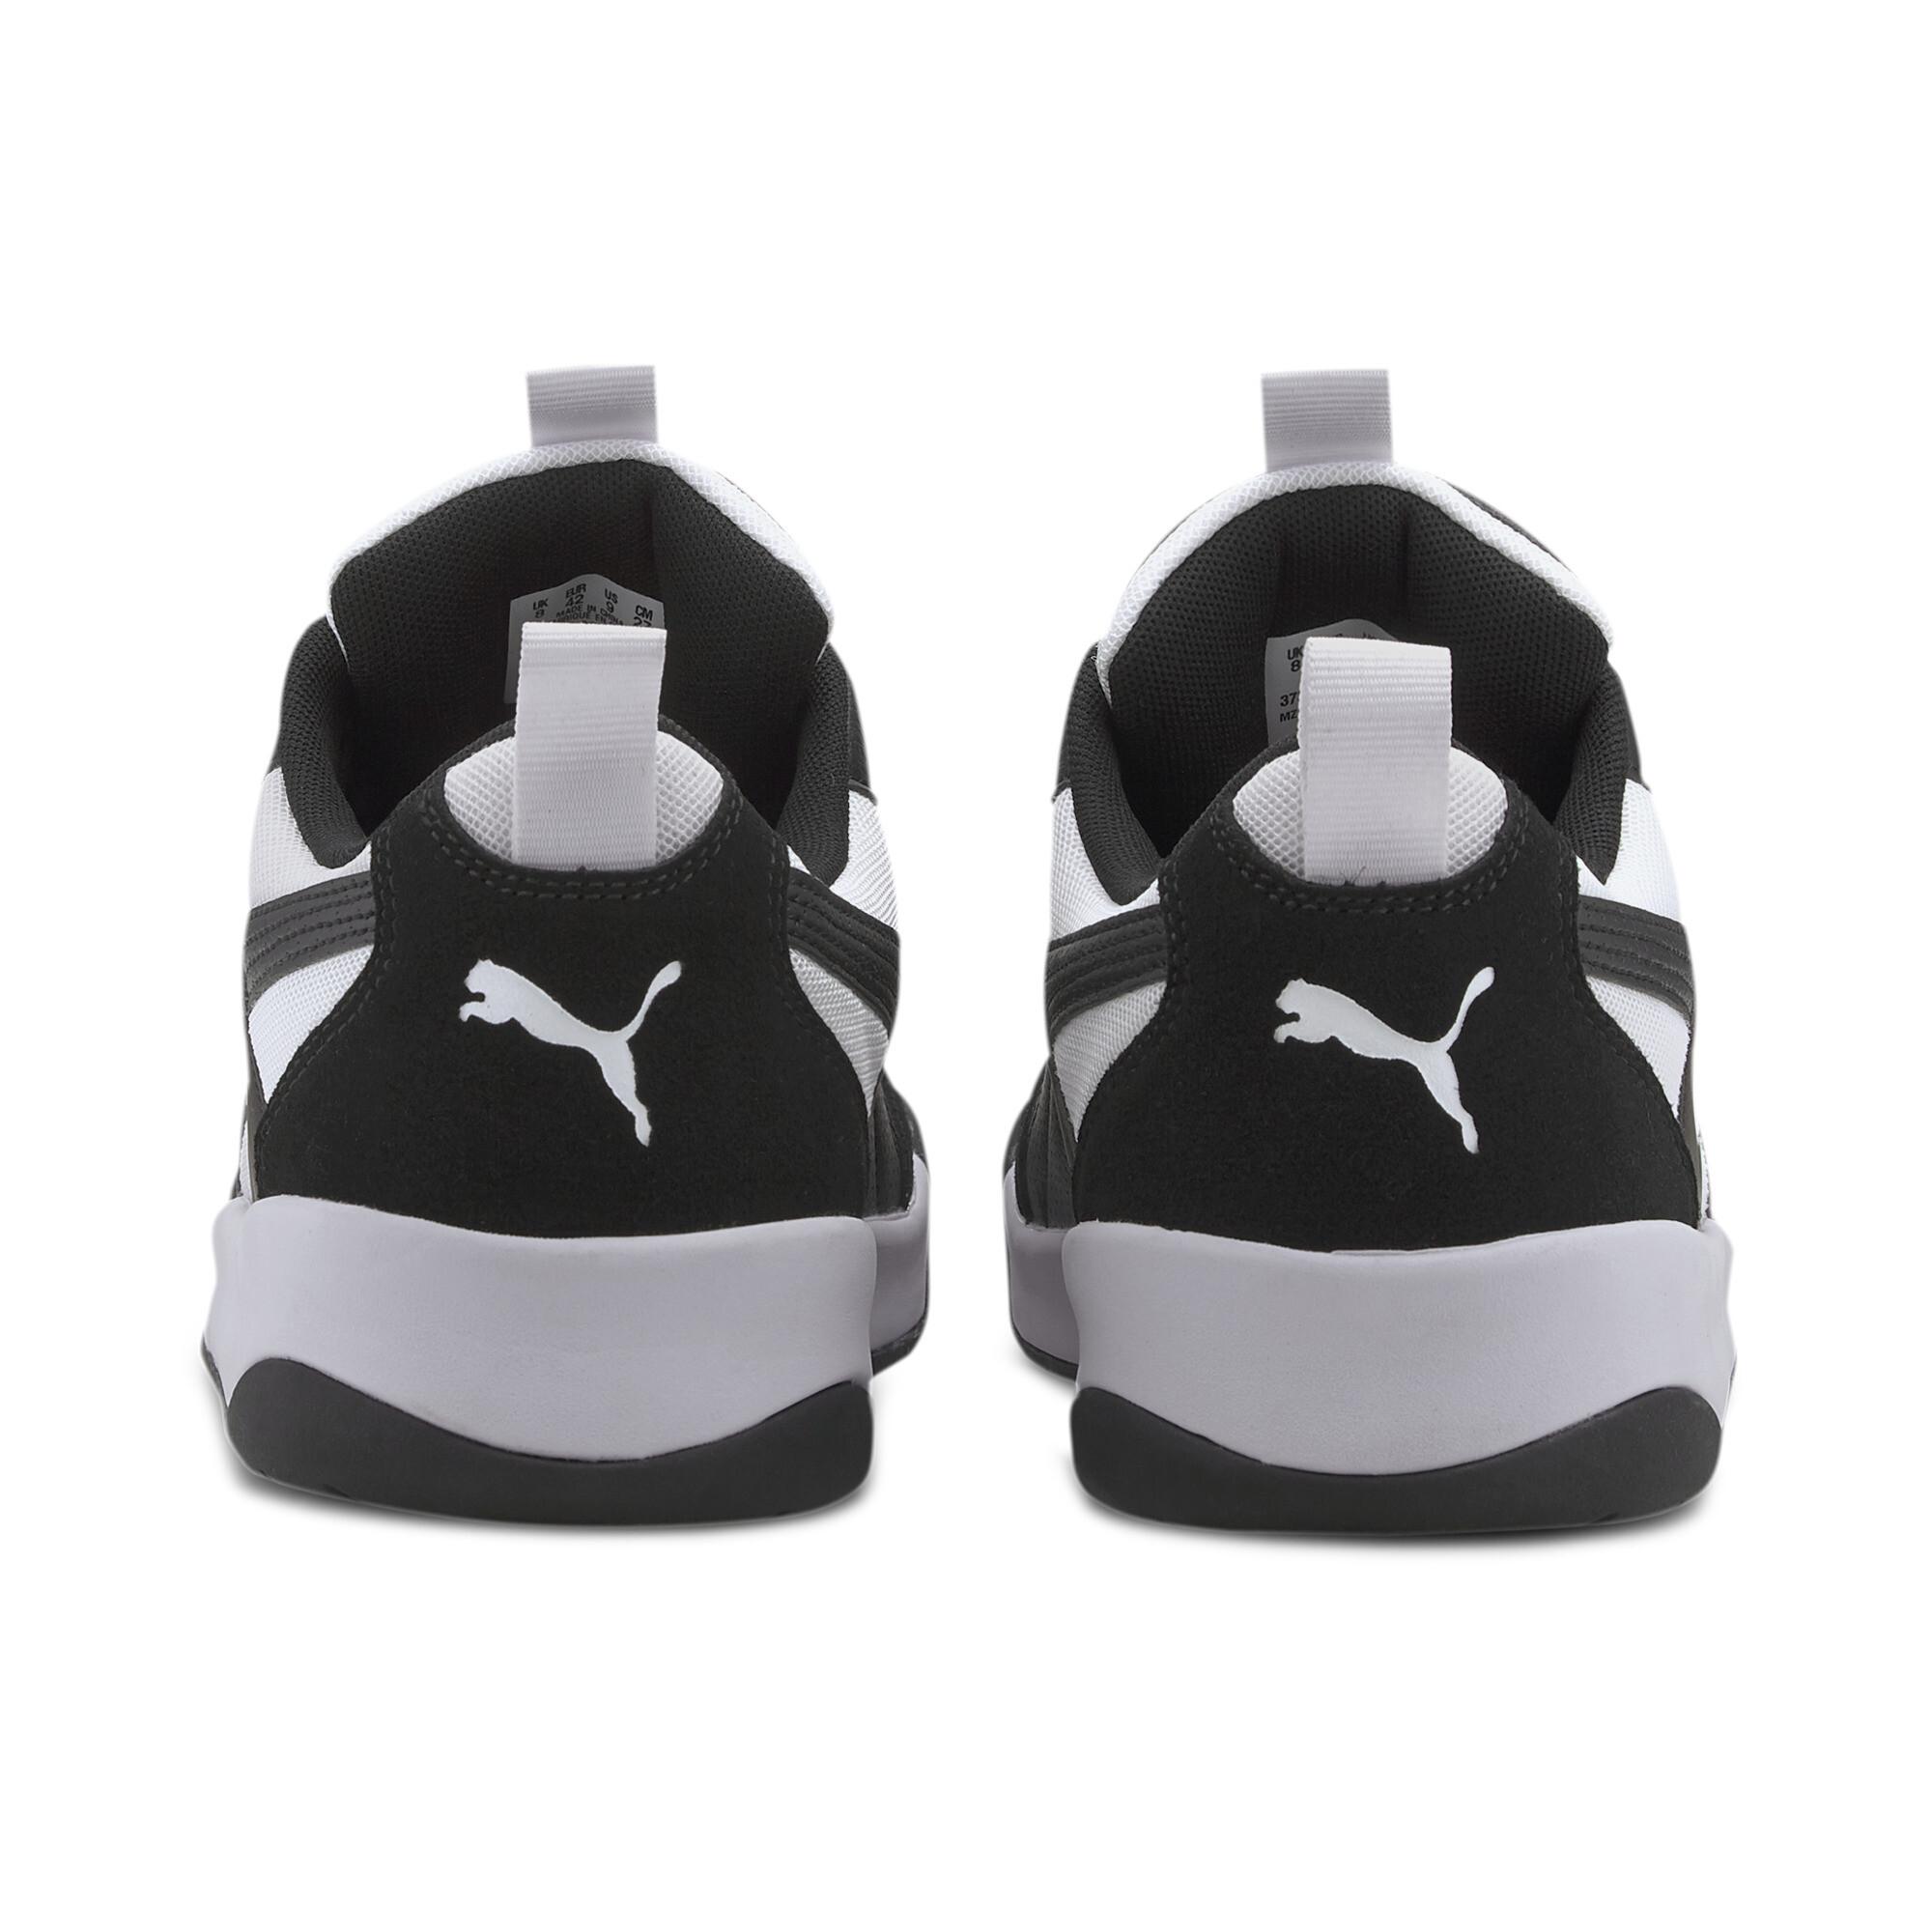 miniature 10 - Puma Men's Backcourt Sneakers